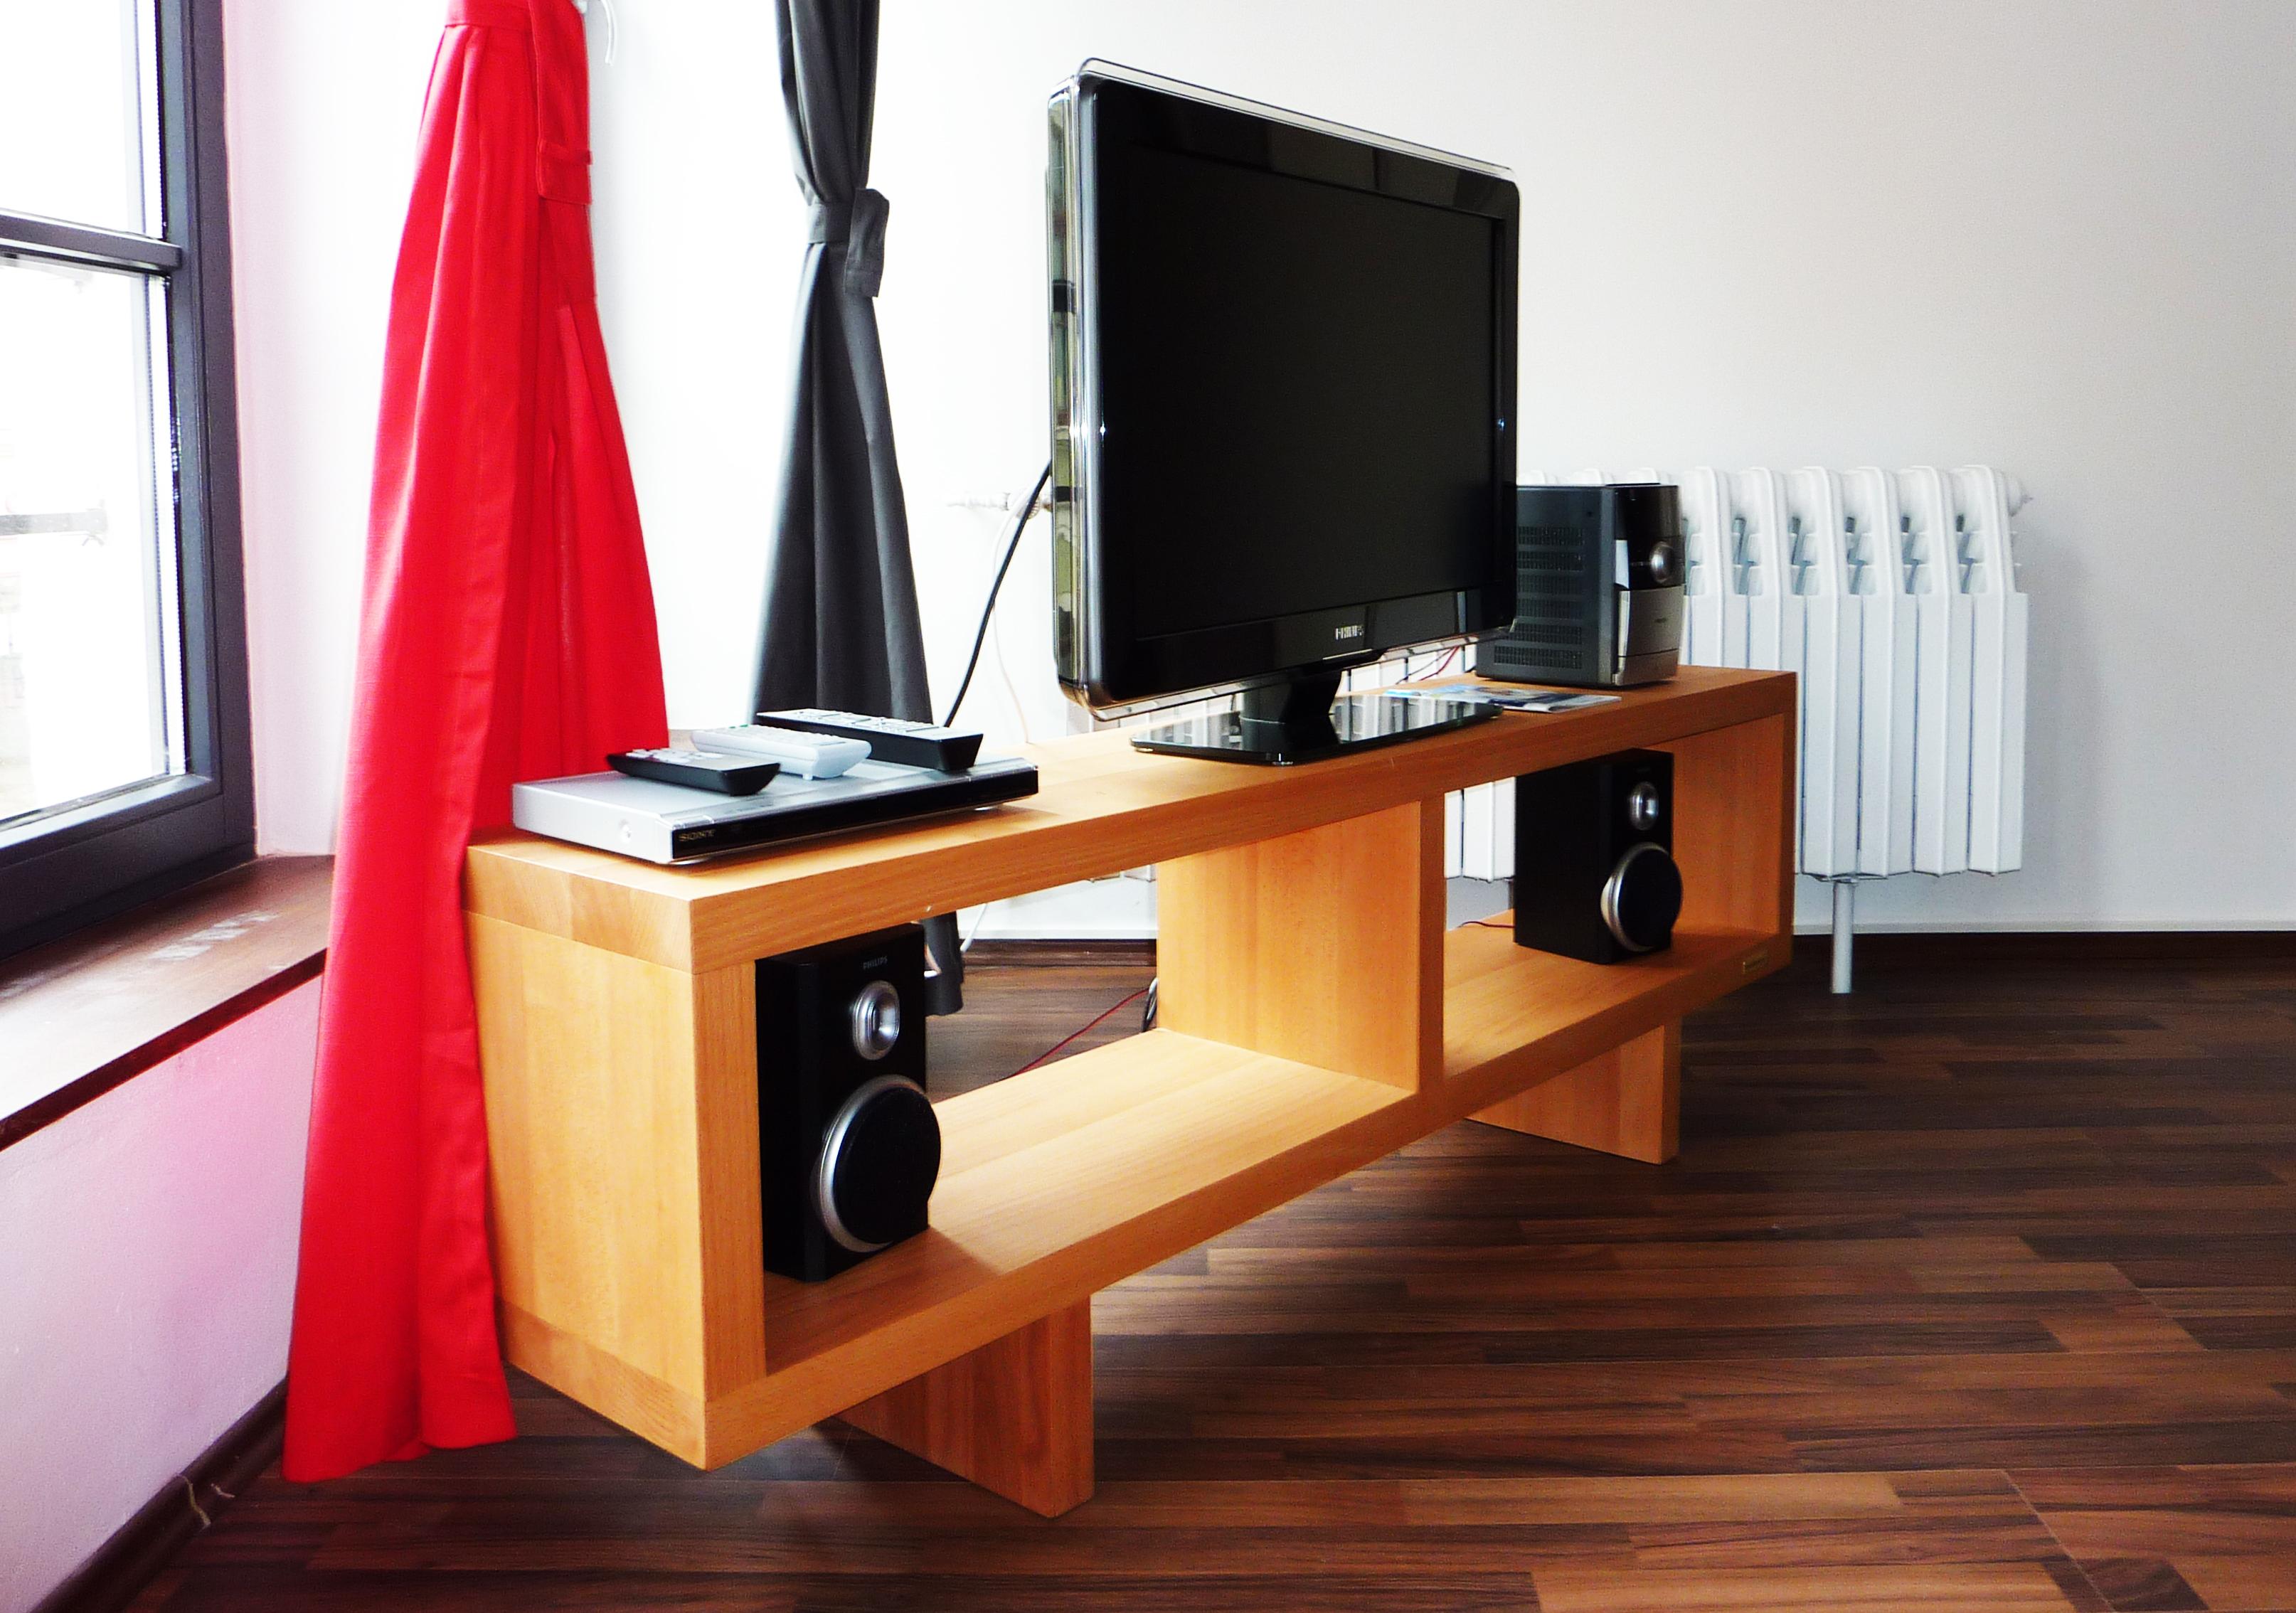 Massivholzmöbel sideboard modern  Günstige Designer Sideboard Möbel Kommode Massivholz modern günstig ...